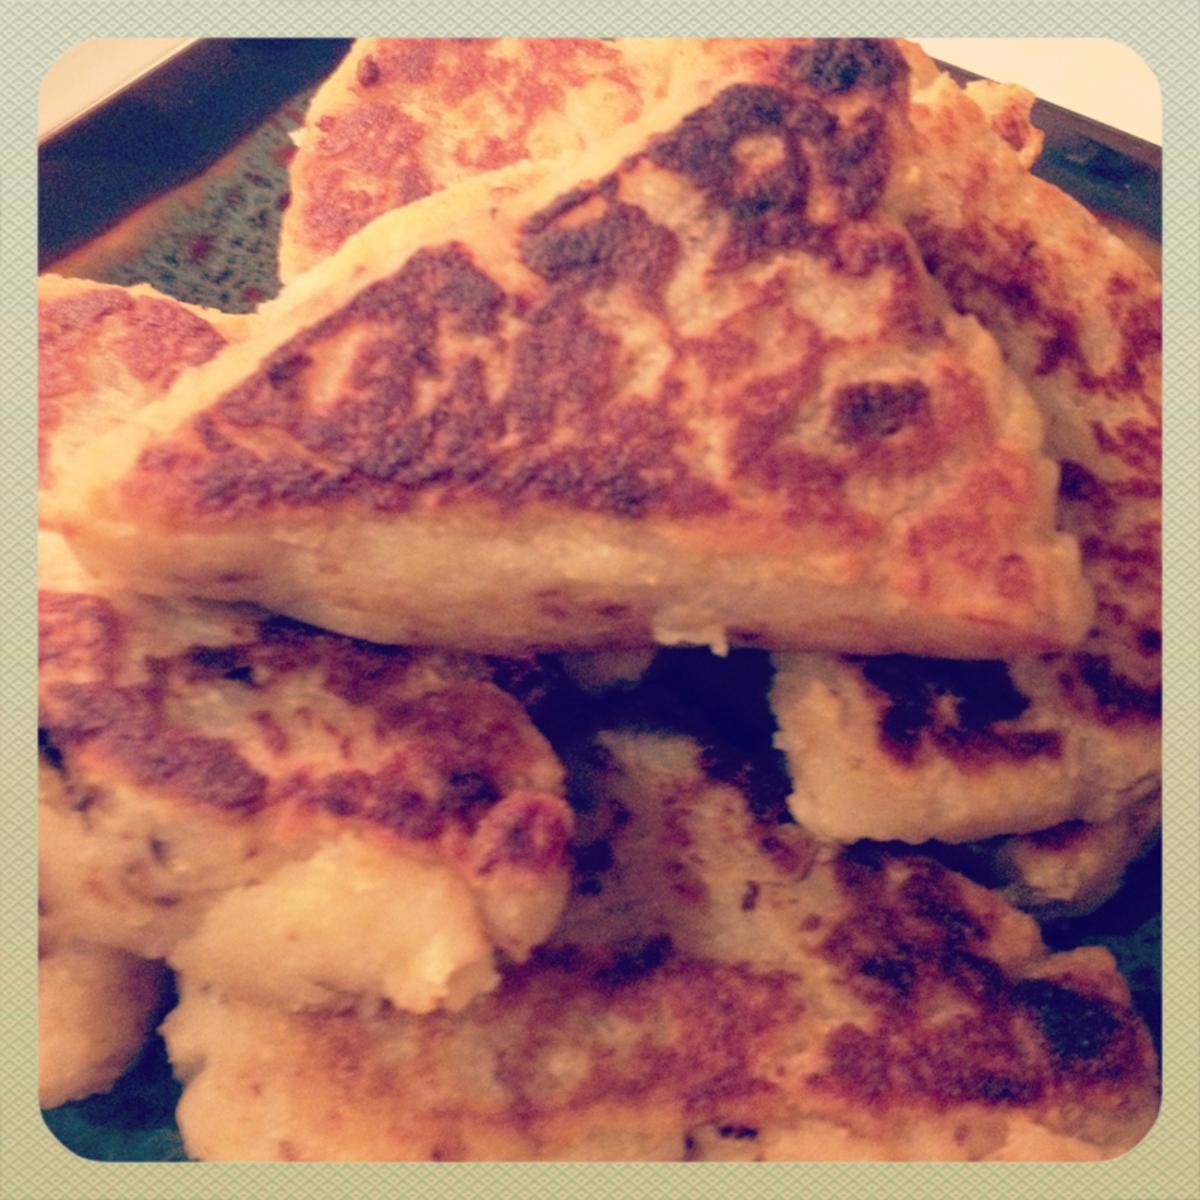 Potato dishes make delicious sides!